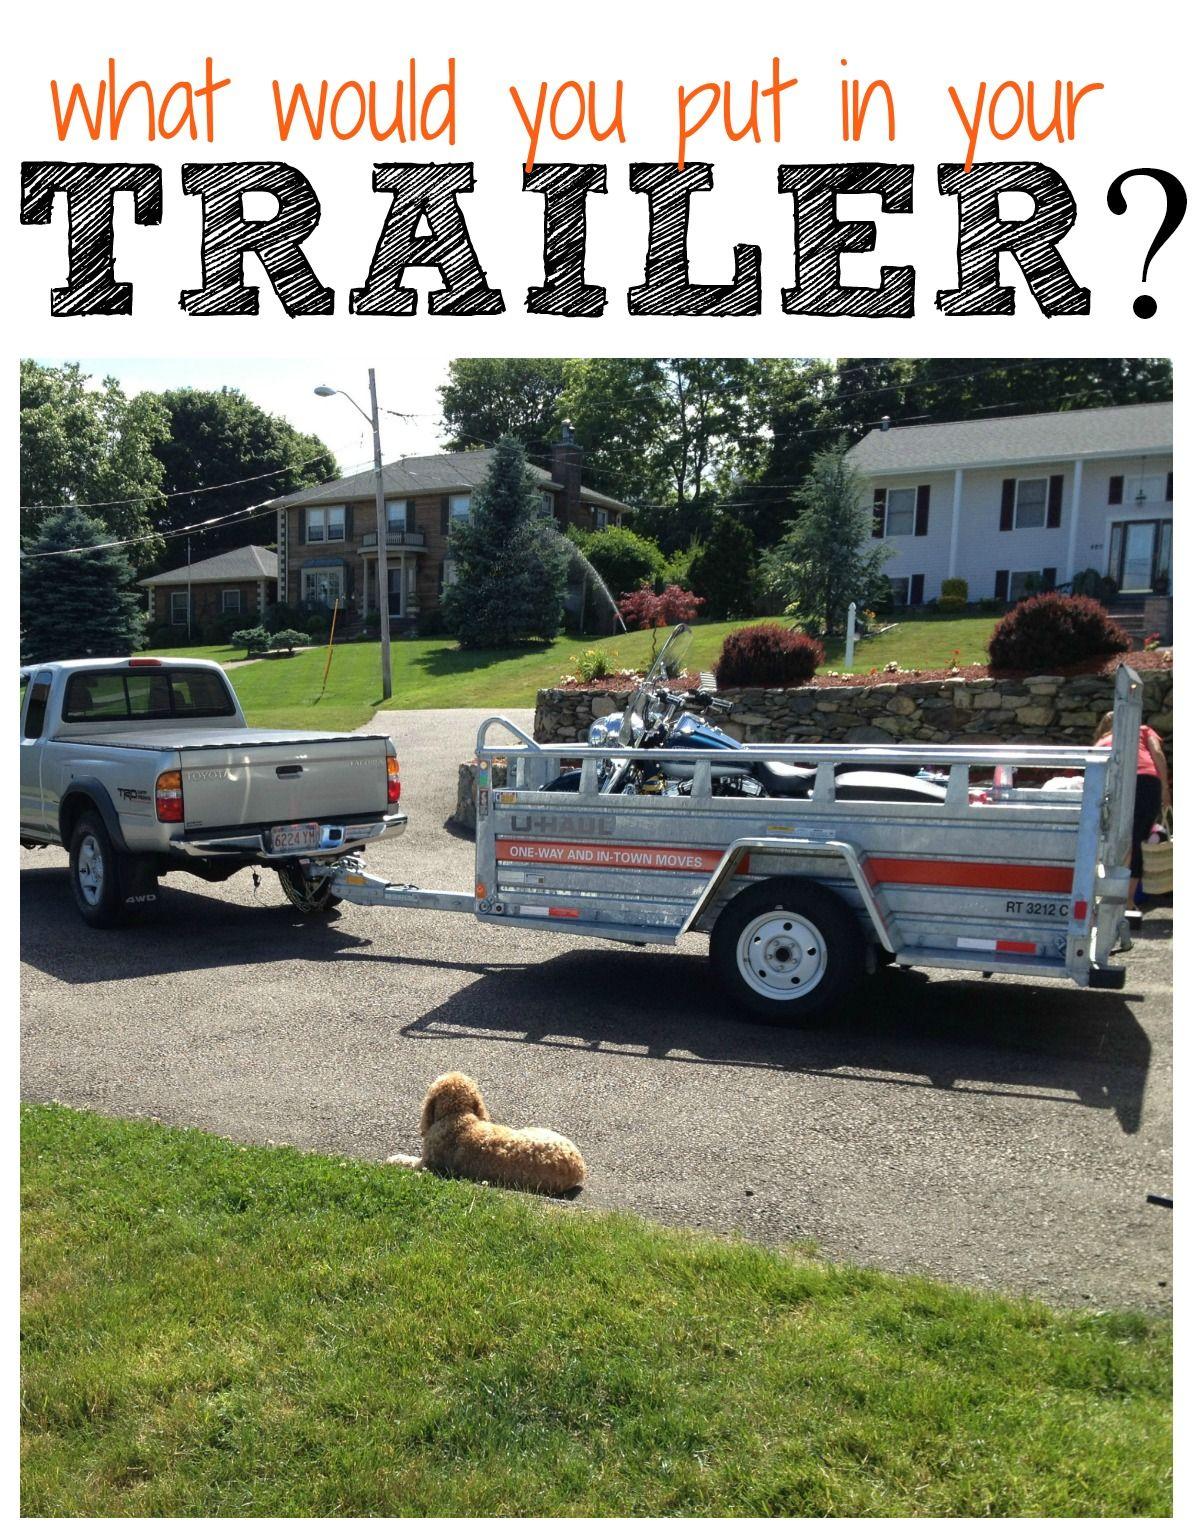 U Haul Rentals Cargo Utility And Car Trailer Rentals Best Gas Mileage Camping Equipment Rental Trailer